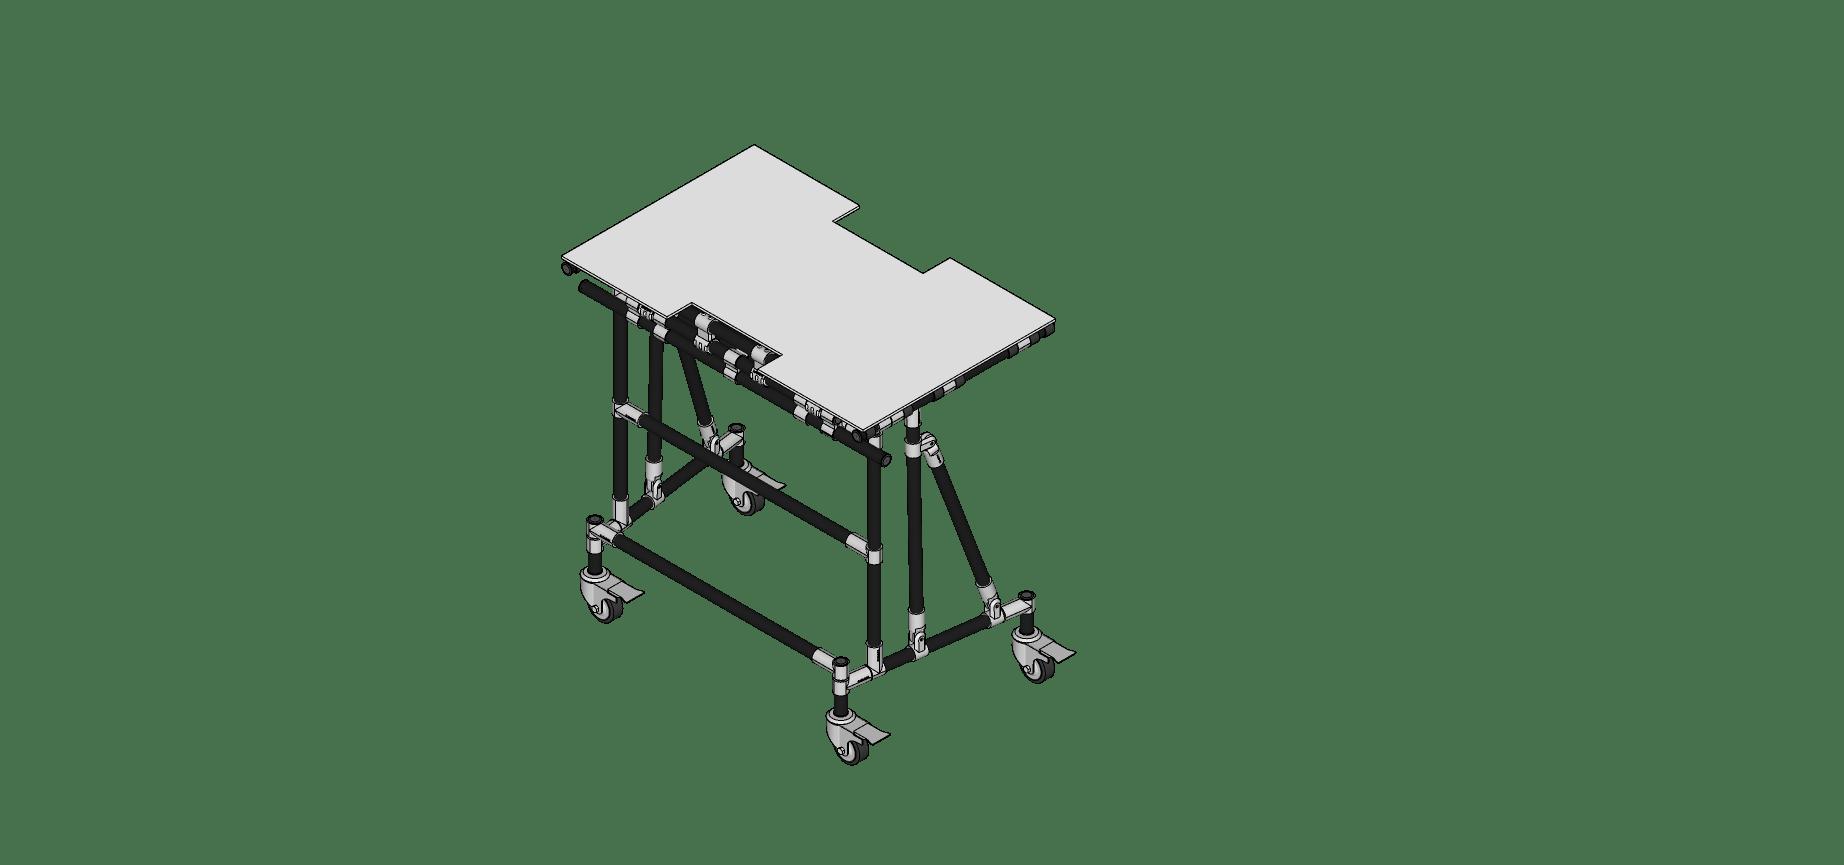 Horizontal Stacking Pivot Table